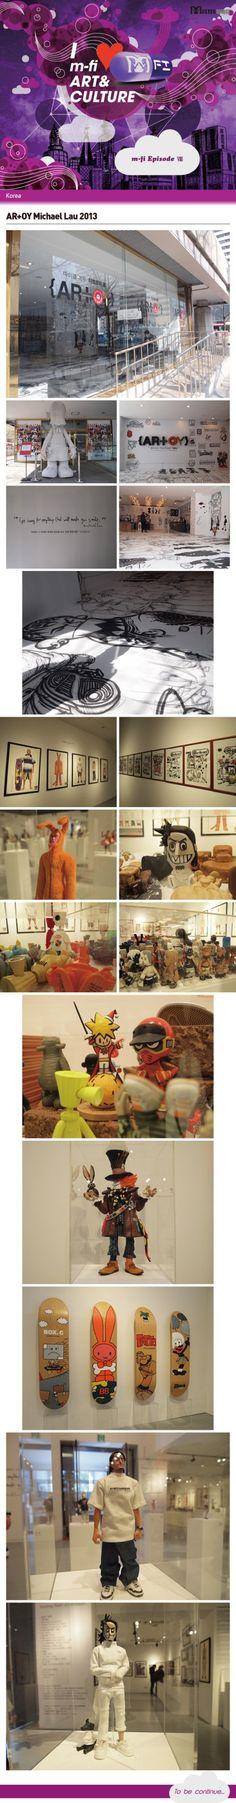 M-Fi《Episode》∥ Art & Culture // WORLD WIDE :: AR+OT Michael Lau 2013 : 네이버 블로그